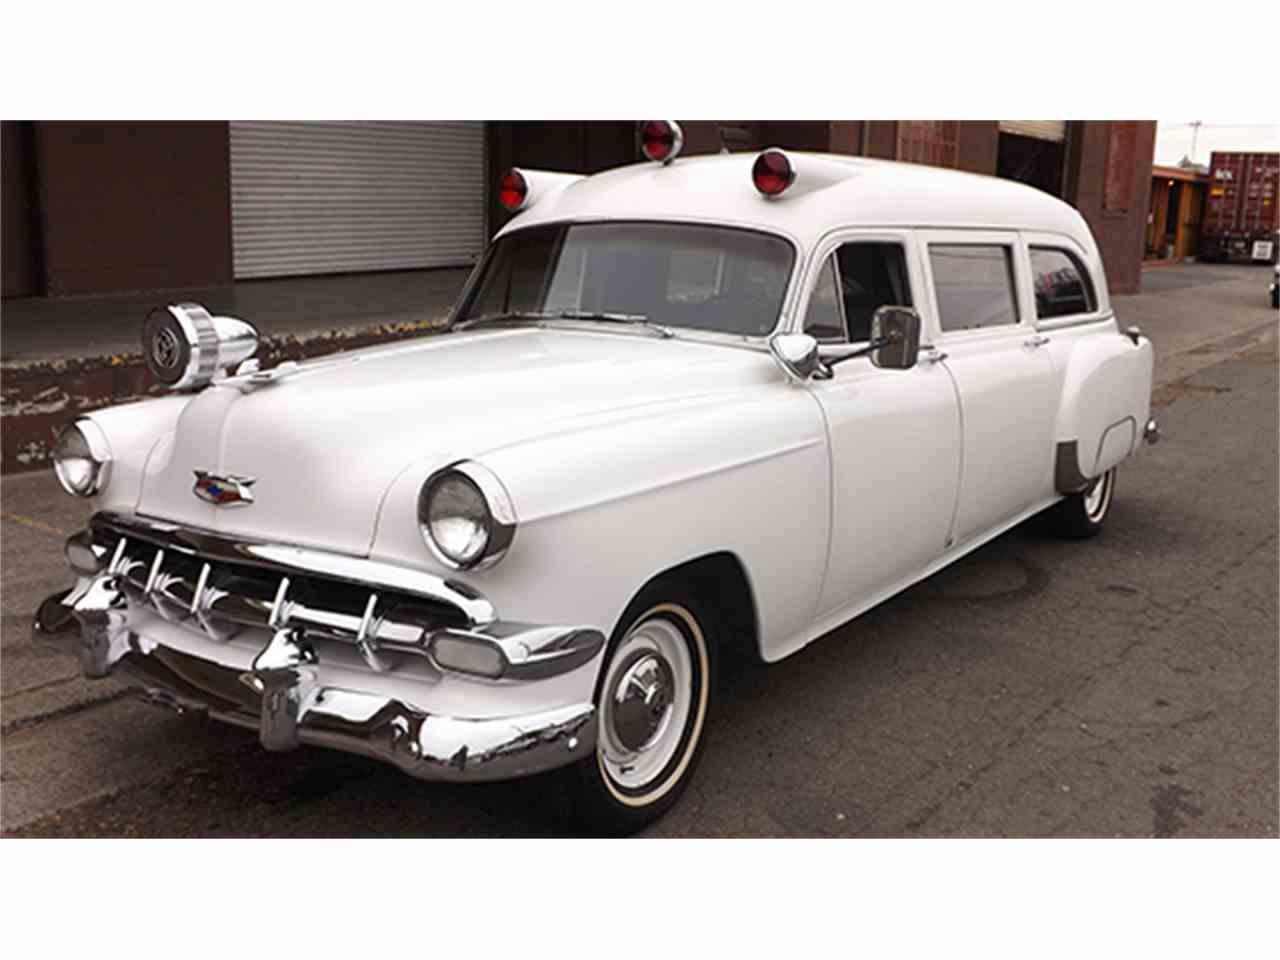 1954 Chevrolet 150 Special Ambulance for Sale | ClassicCars.com | CC ...